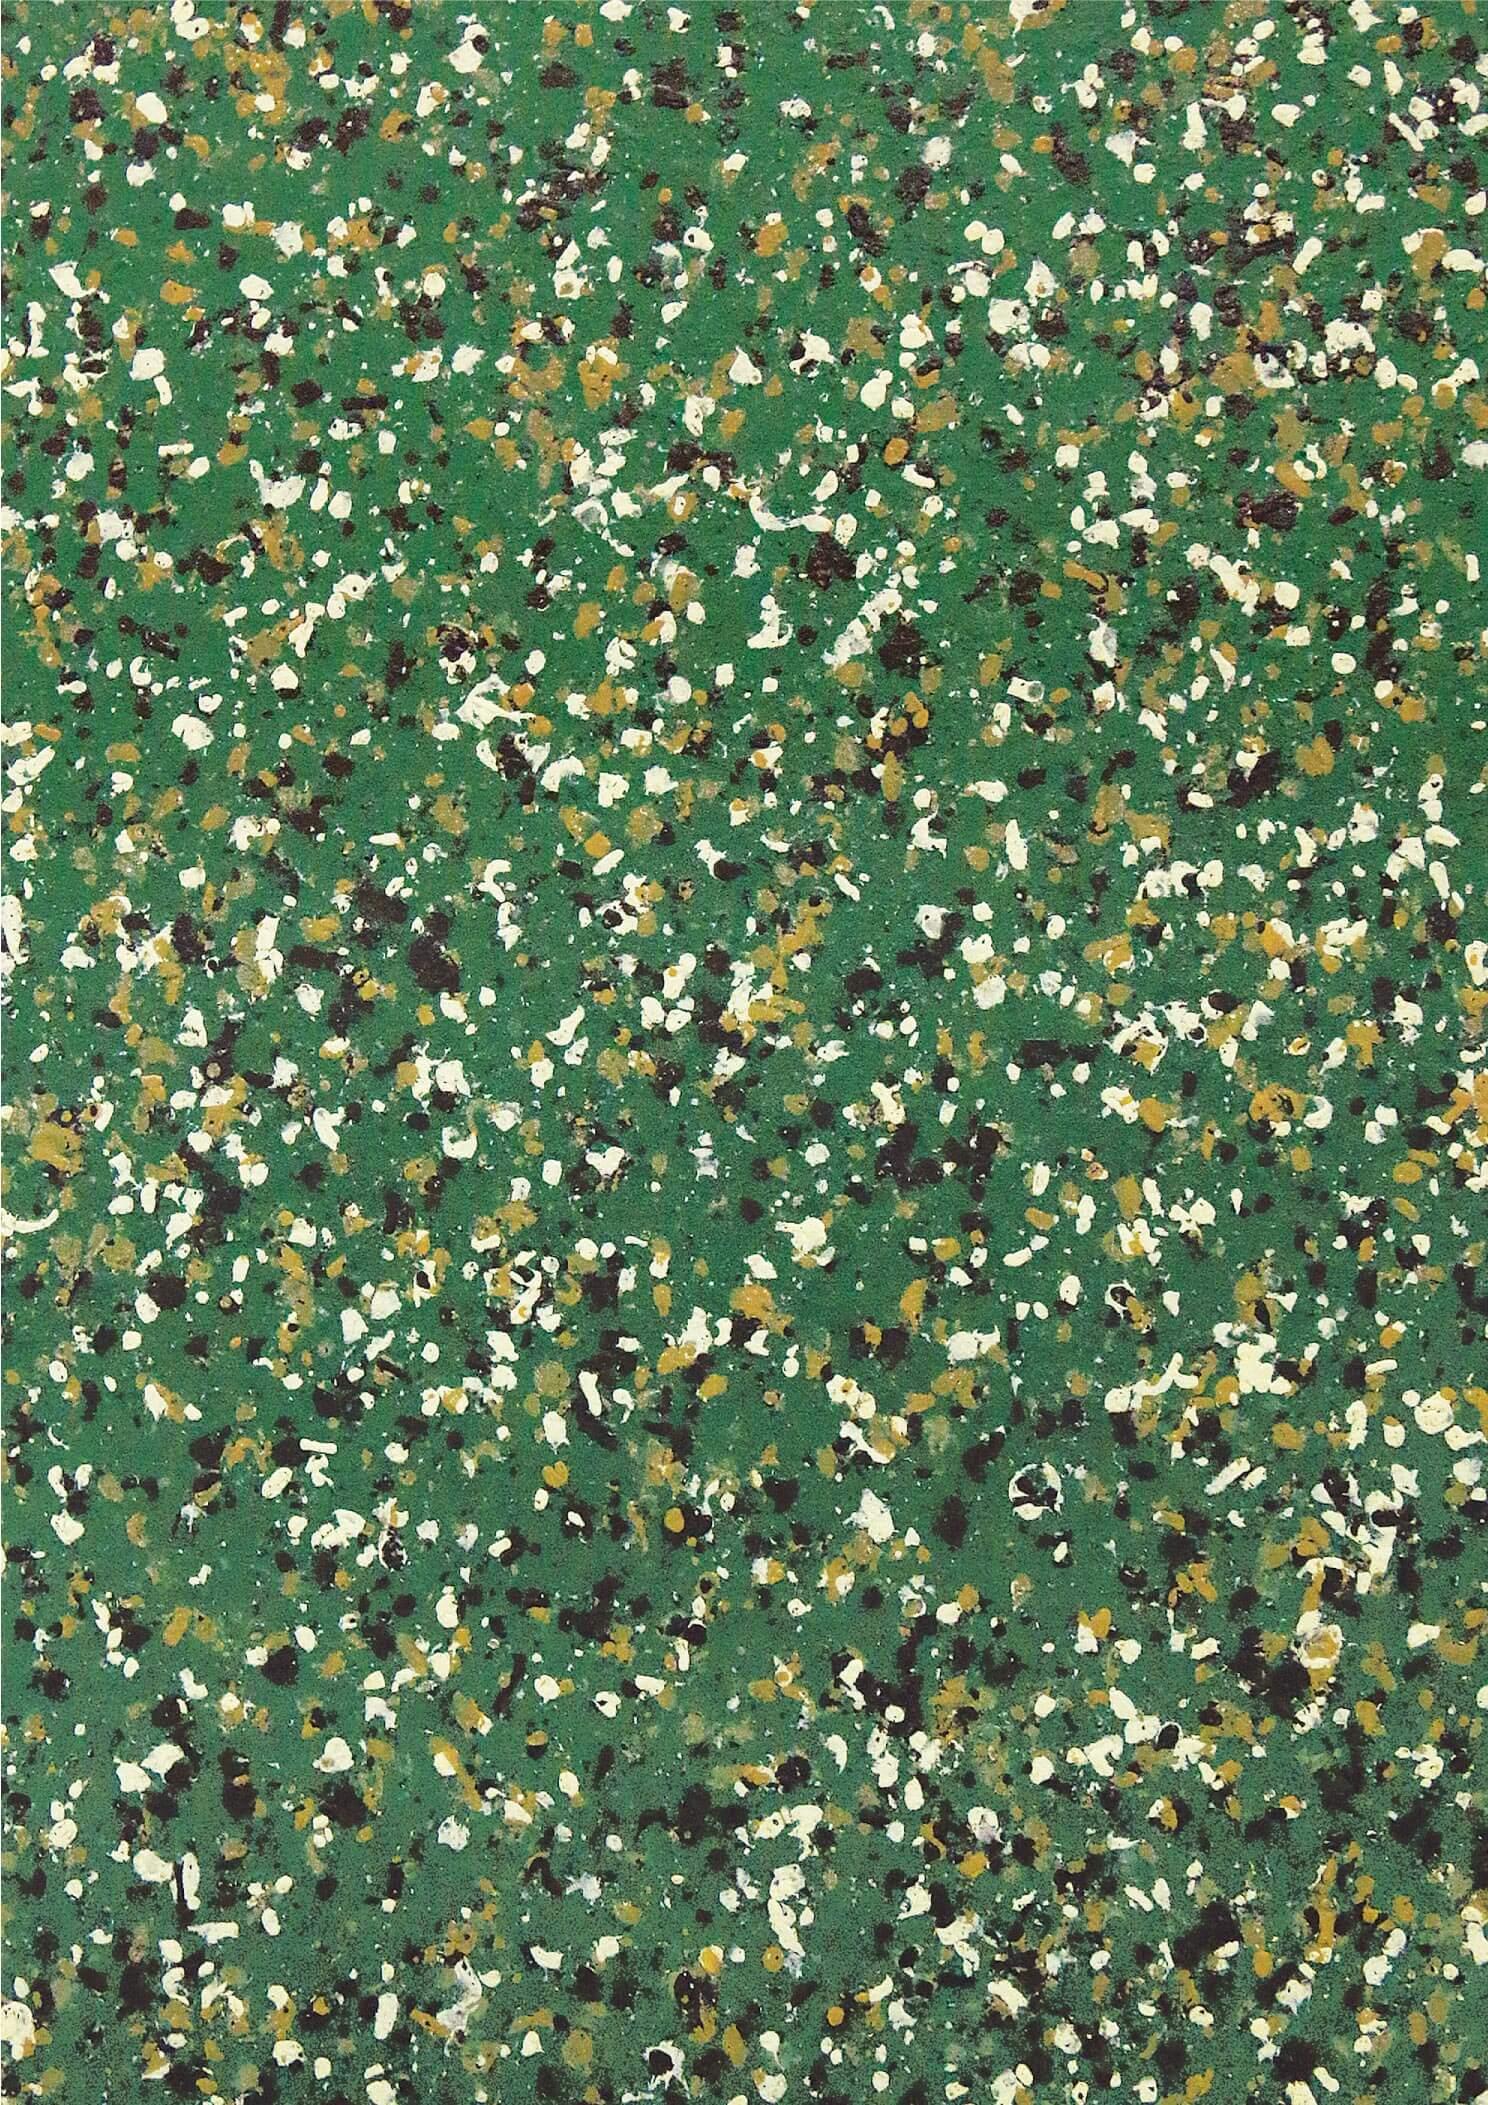 GREEN ABYSS BGG 1799A AMARELO SA003